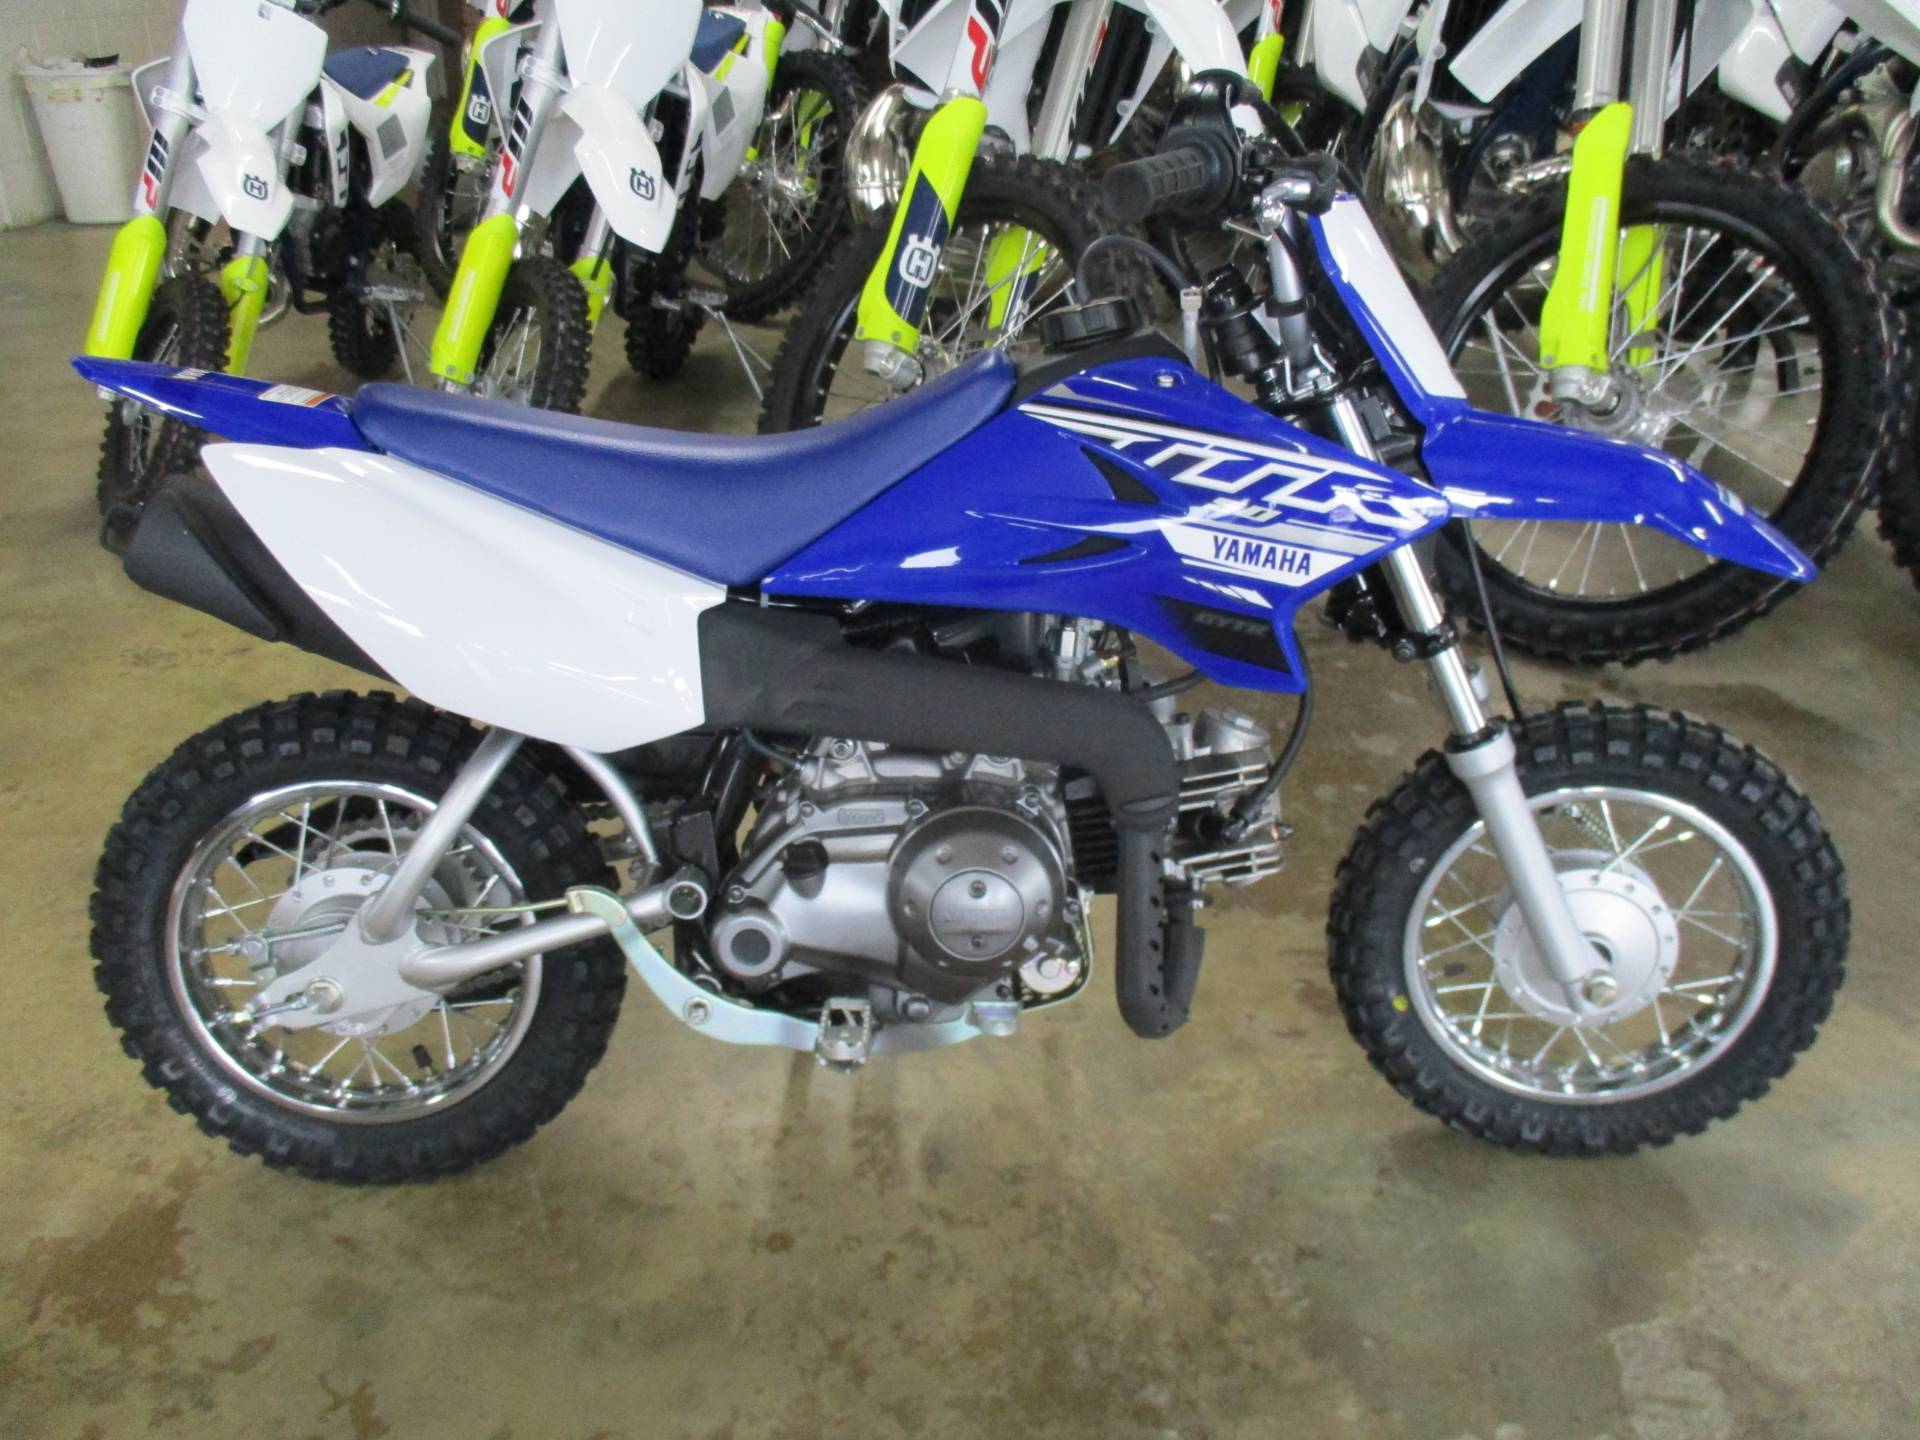 New 2019 Yamaha TT-R50E | Motorcycles in Hendersonville NC